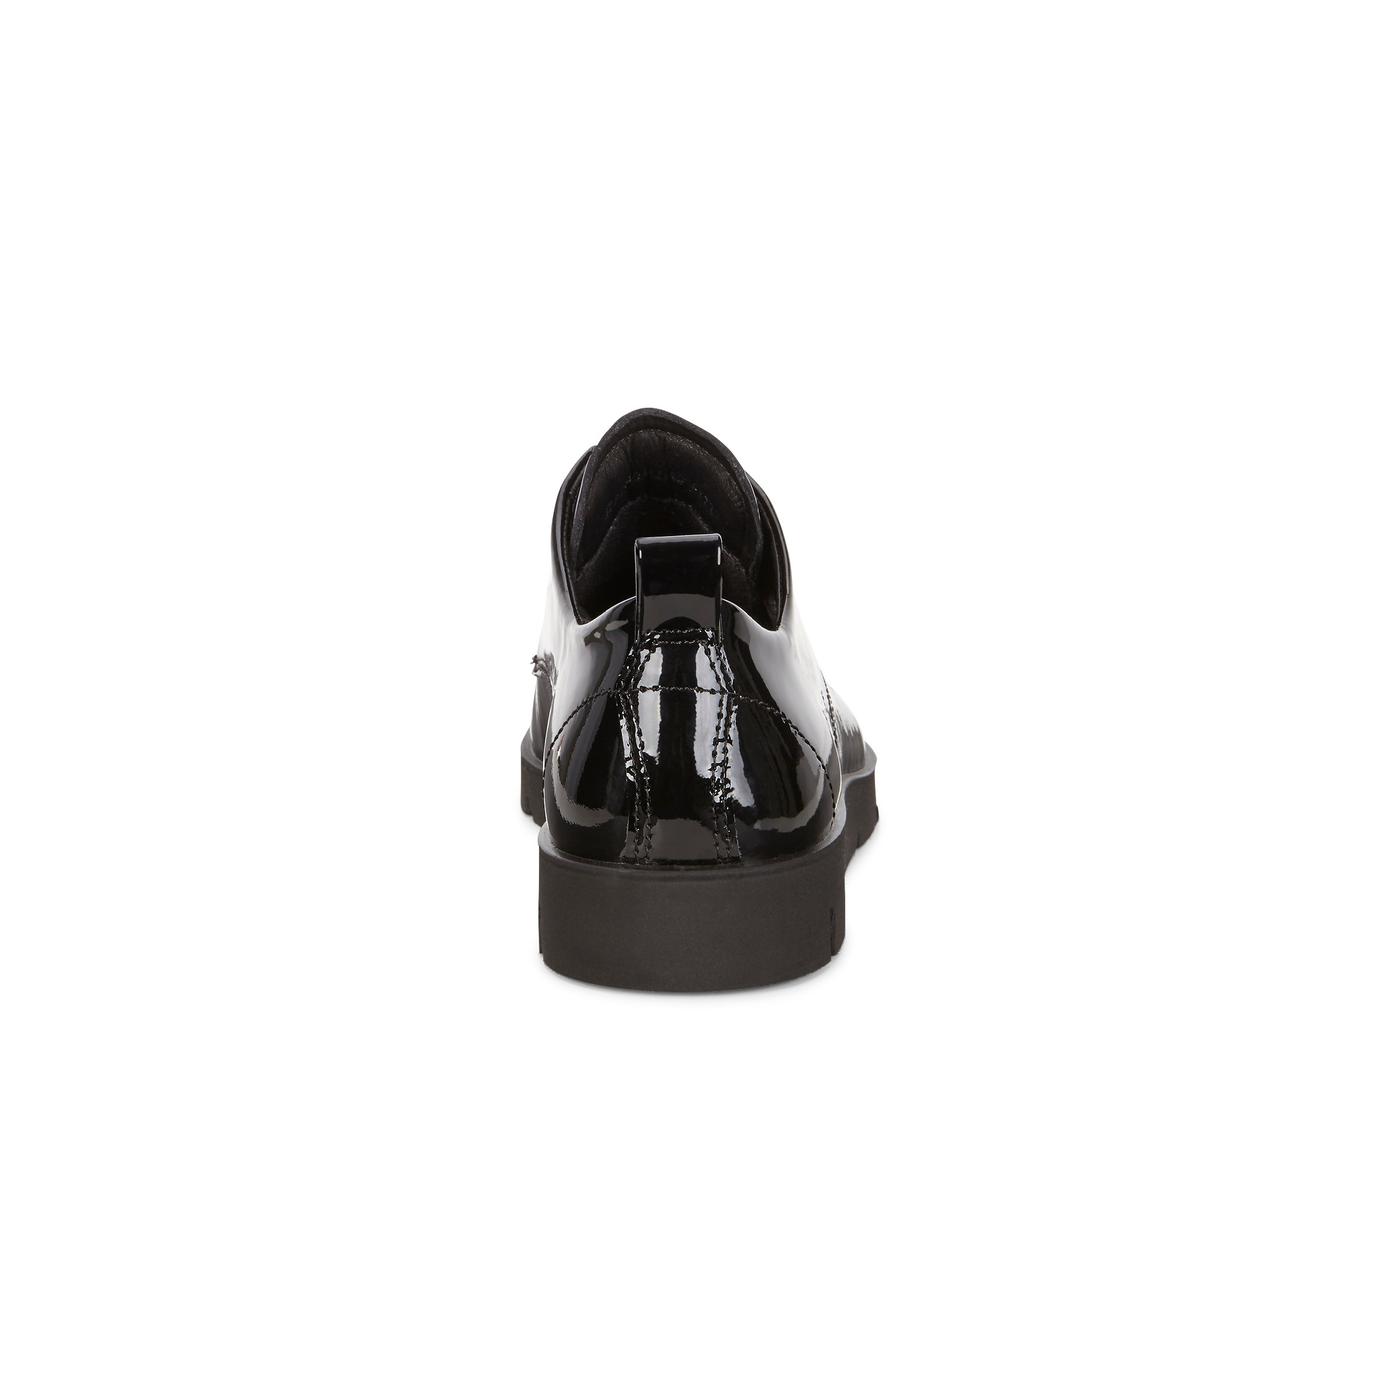 44a0d5676e ECCO Bella   Women's Casual Tie Shoes   ECCO® Shoes